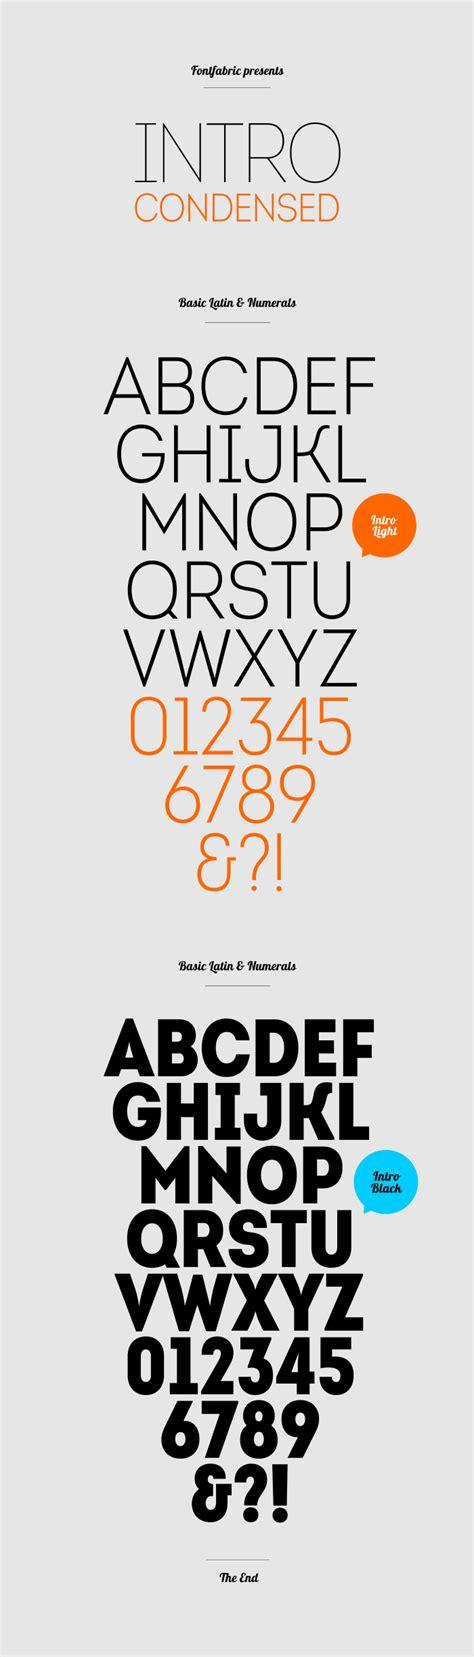 printed fontfabric free font intro condensed fontfabric